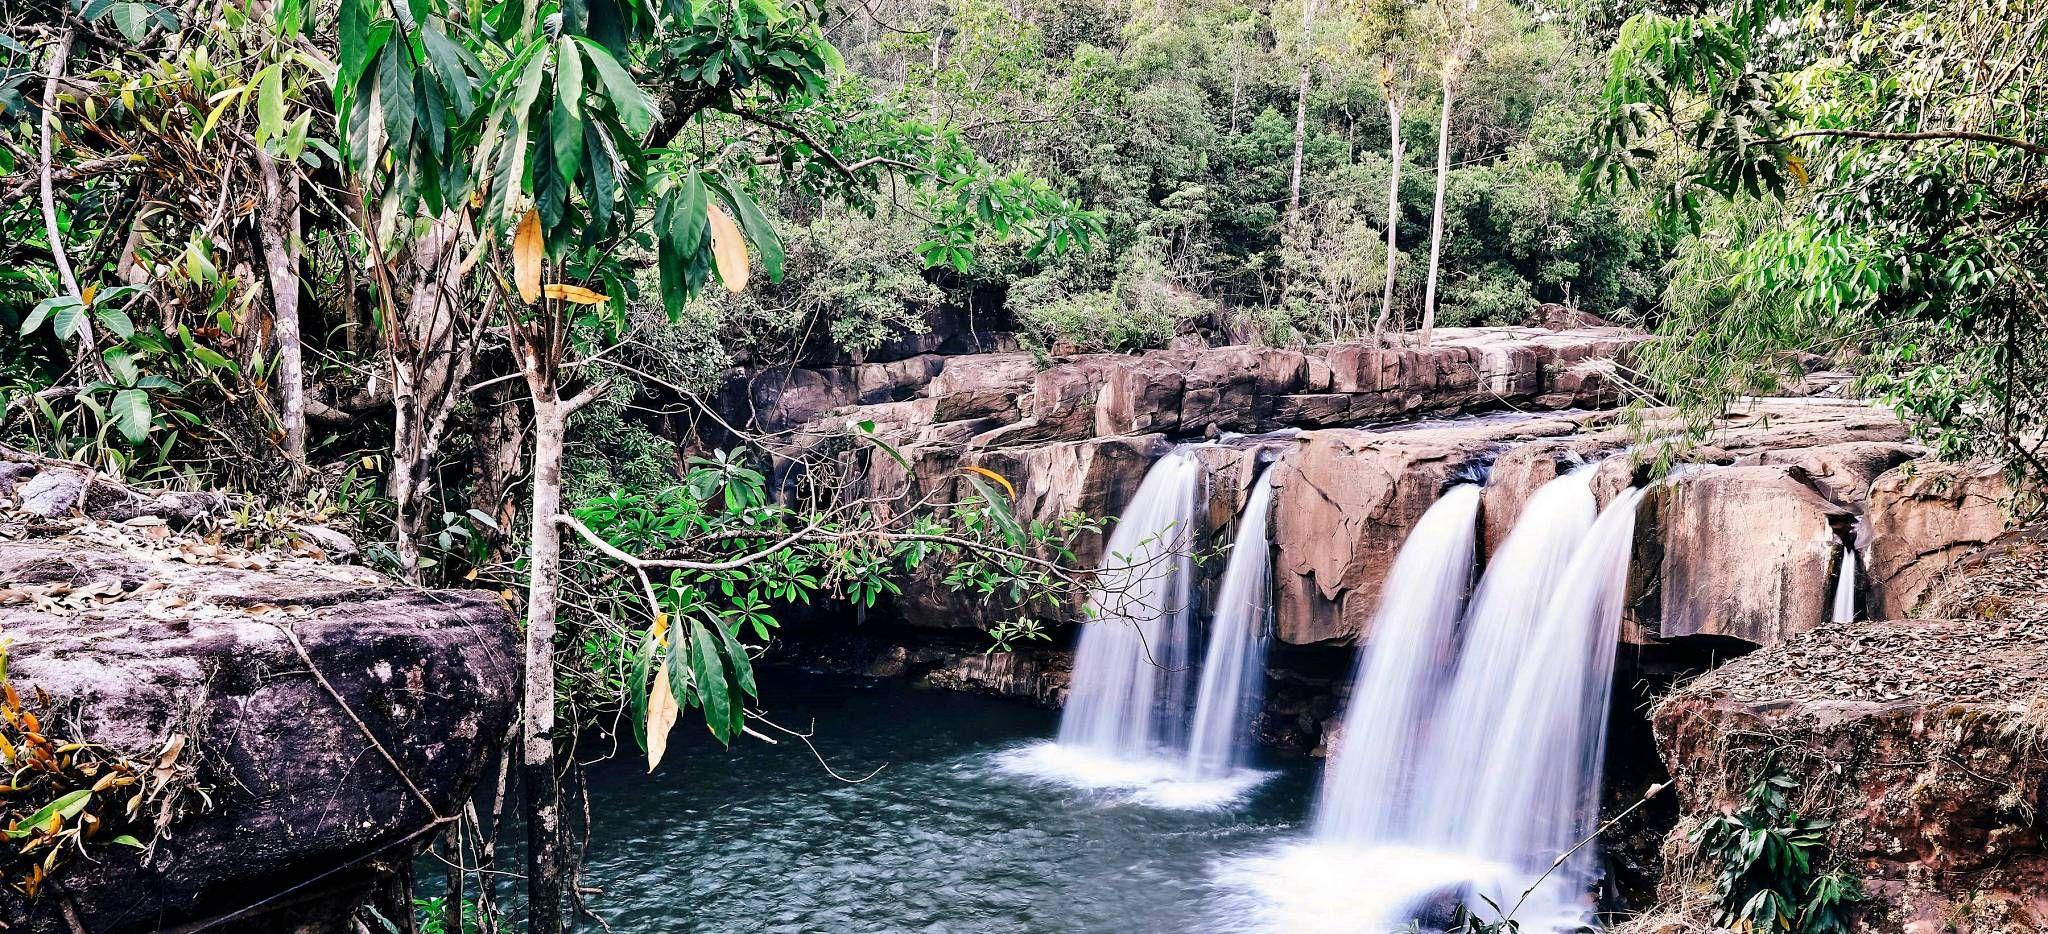 Wasserfall im Dschungel Kambodschas, nahe dem Hotel Shita Mani Wild